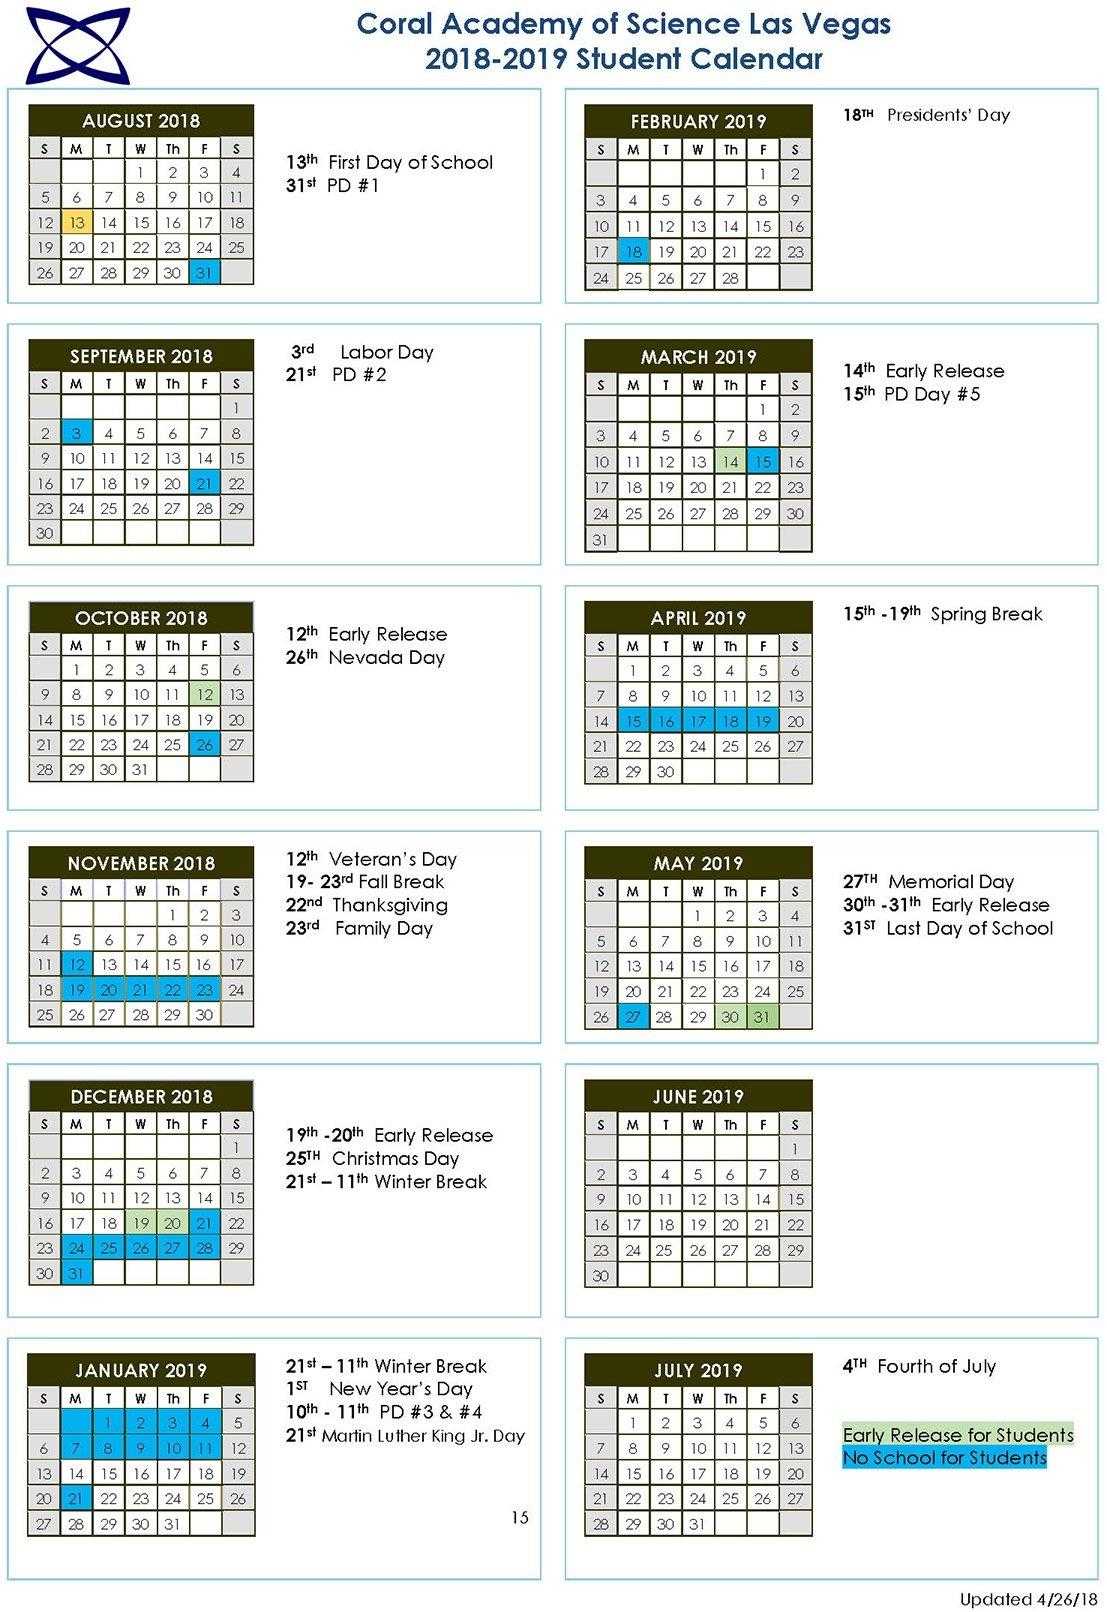 School Calendar 2018 2019   Coral Academy Of Science Las Vegas Calendar 2019 Spring Break